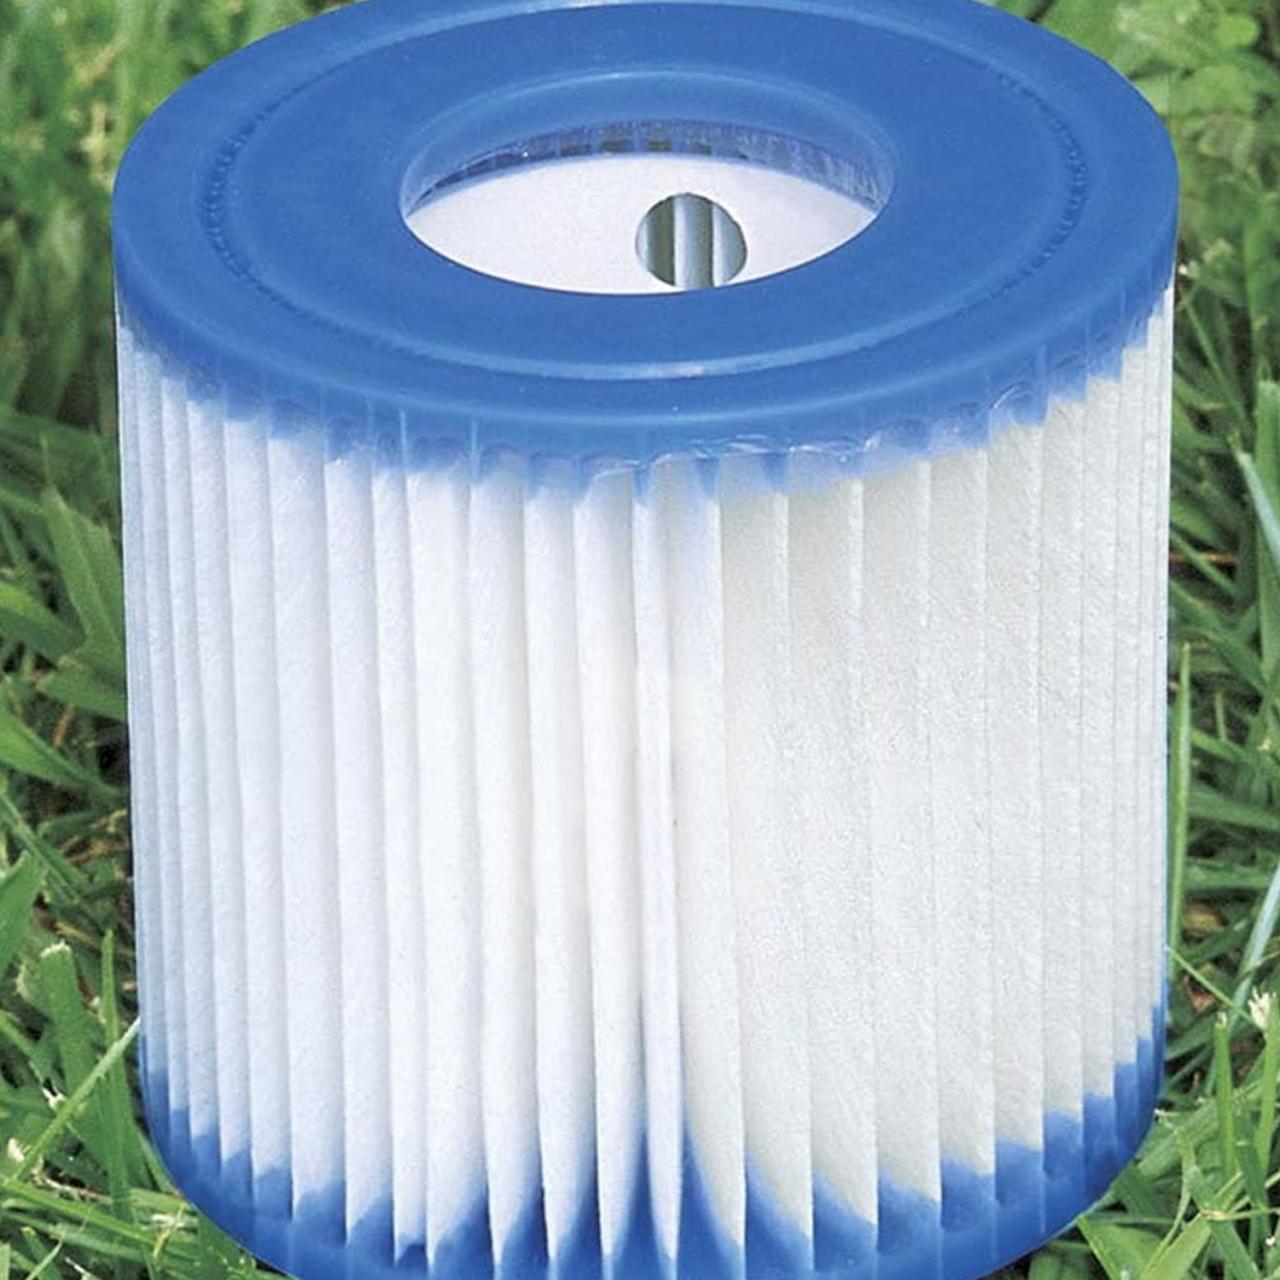 Intex 12x Filterkartuschen 29007 Typ H 12 Stück im 12er Pack für Pumpe